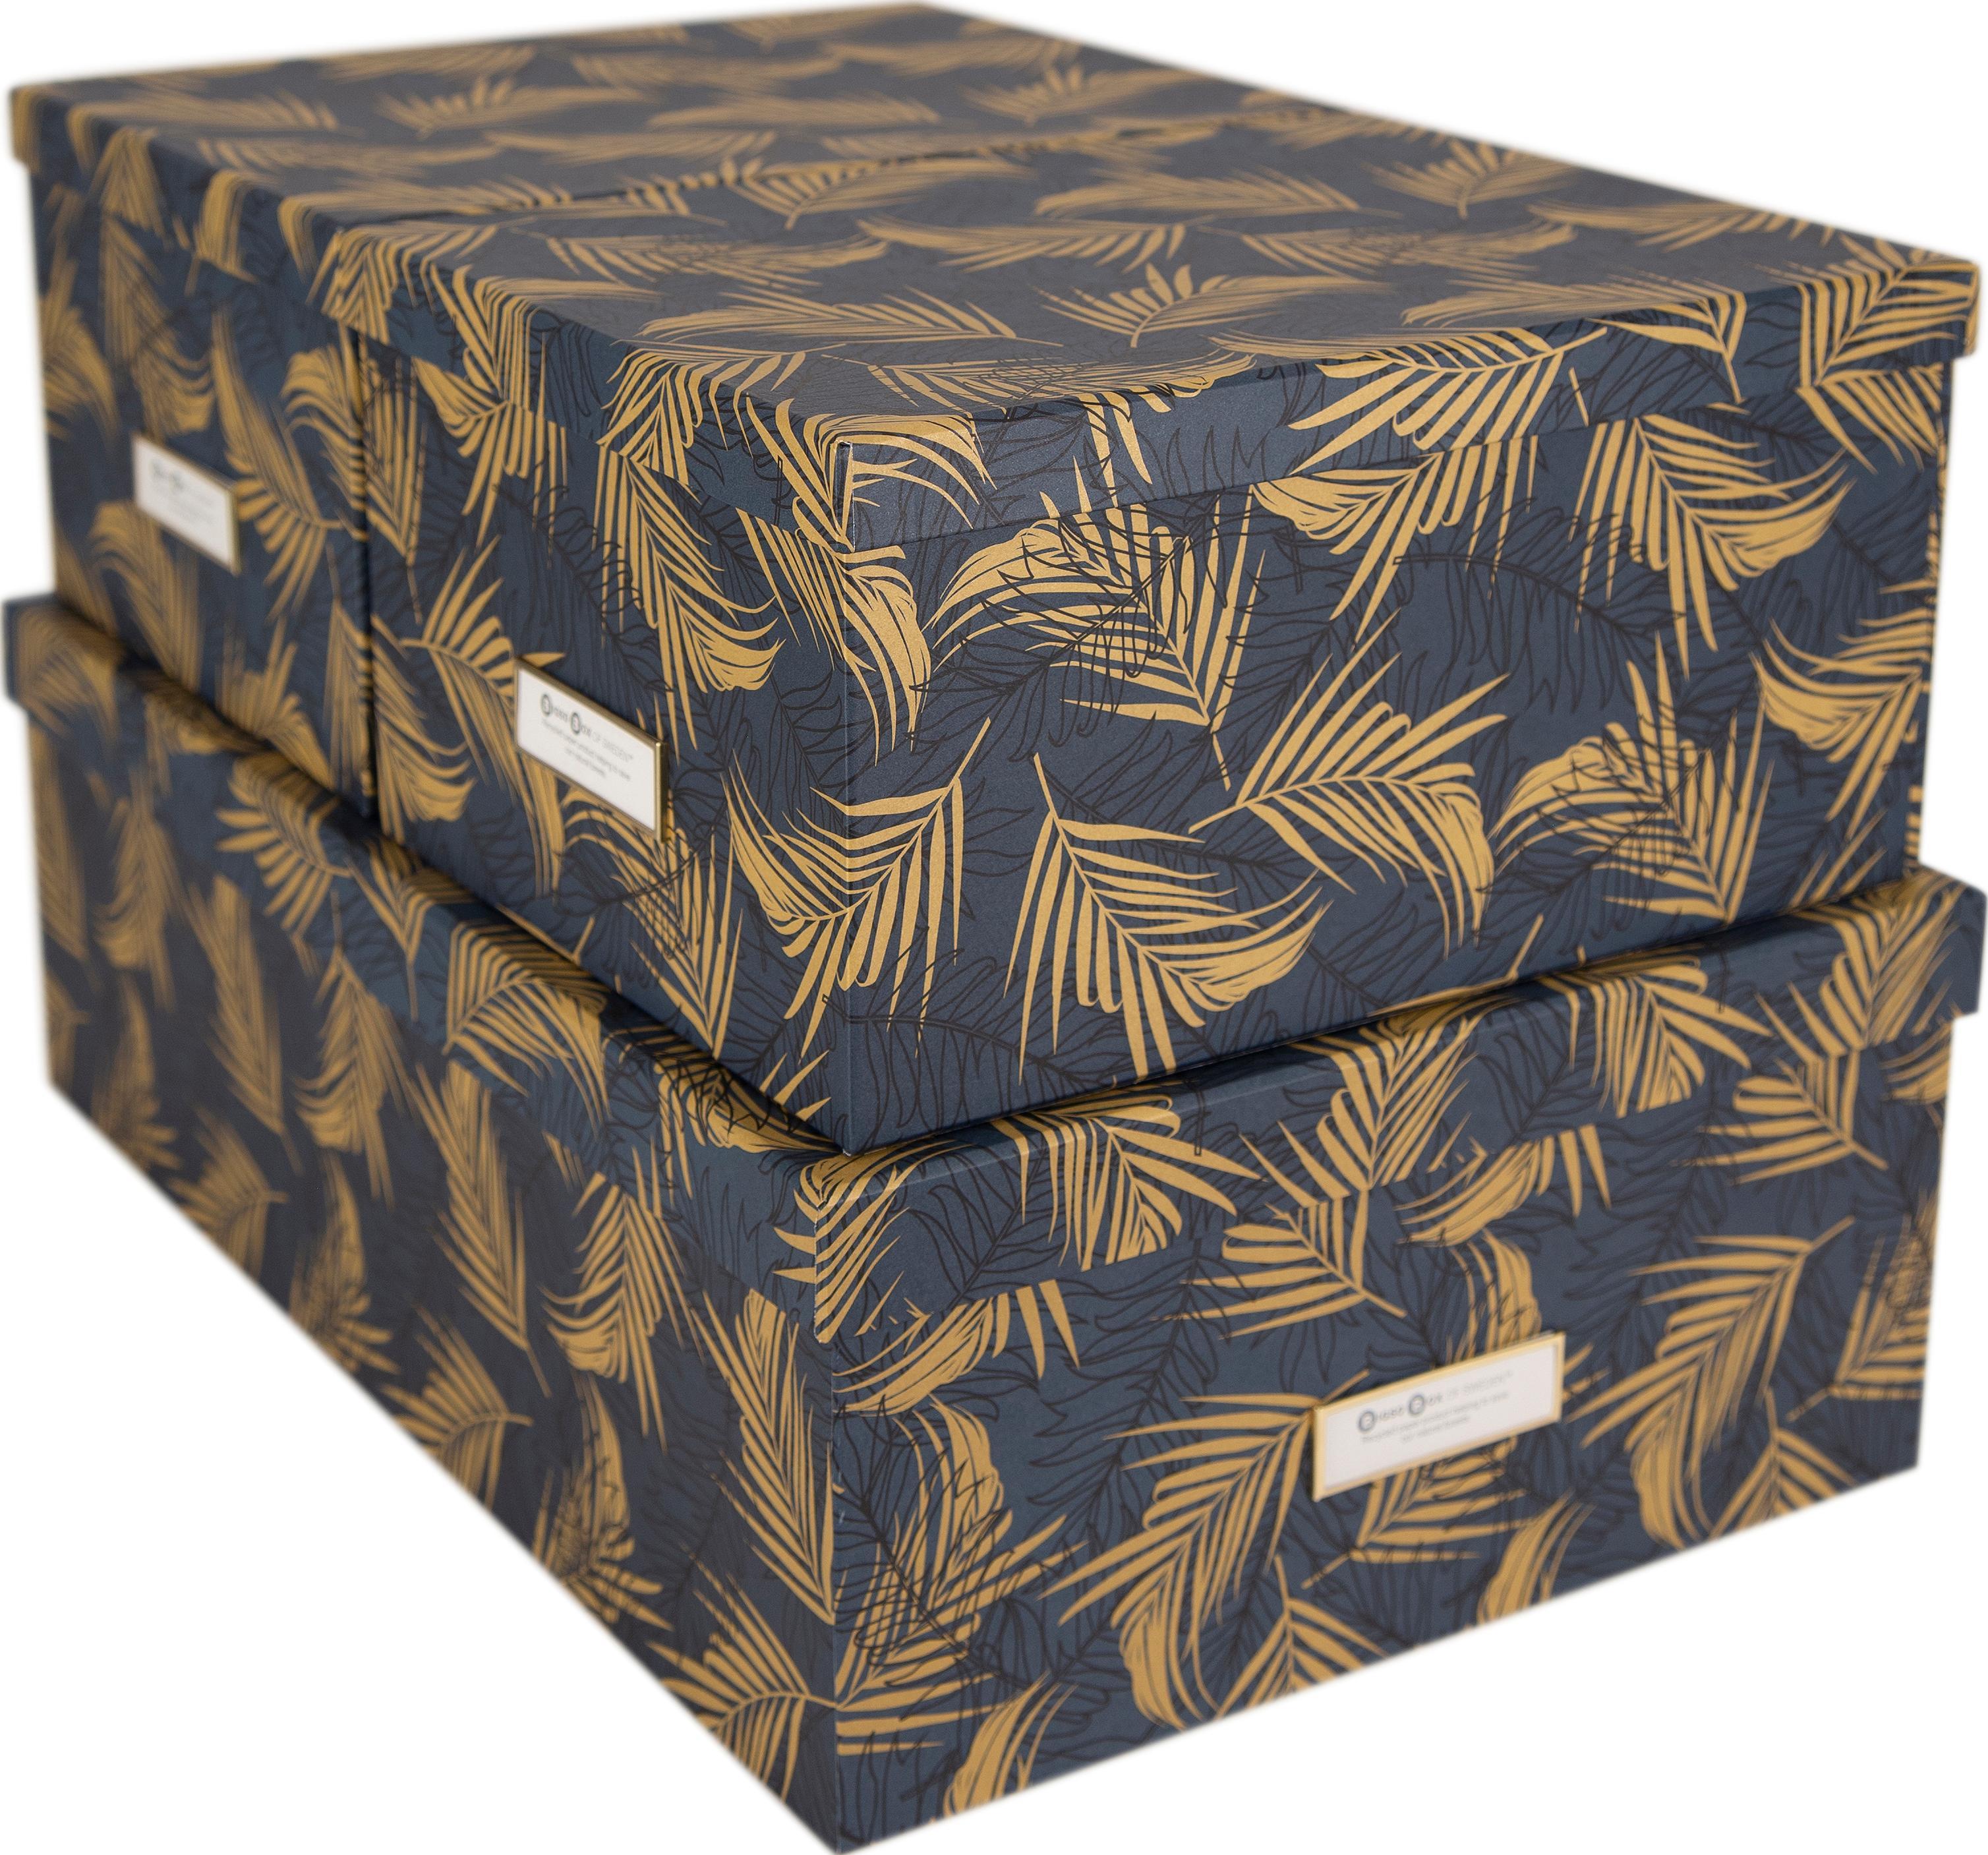 Set de cajas Inge, 3pzas., Caja: cartón laminado, Dorado, gris azulado, Tamaños diferentes